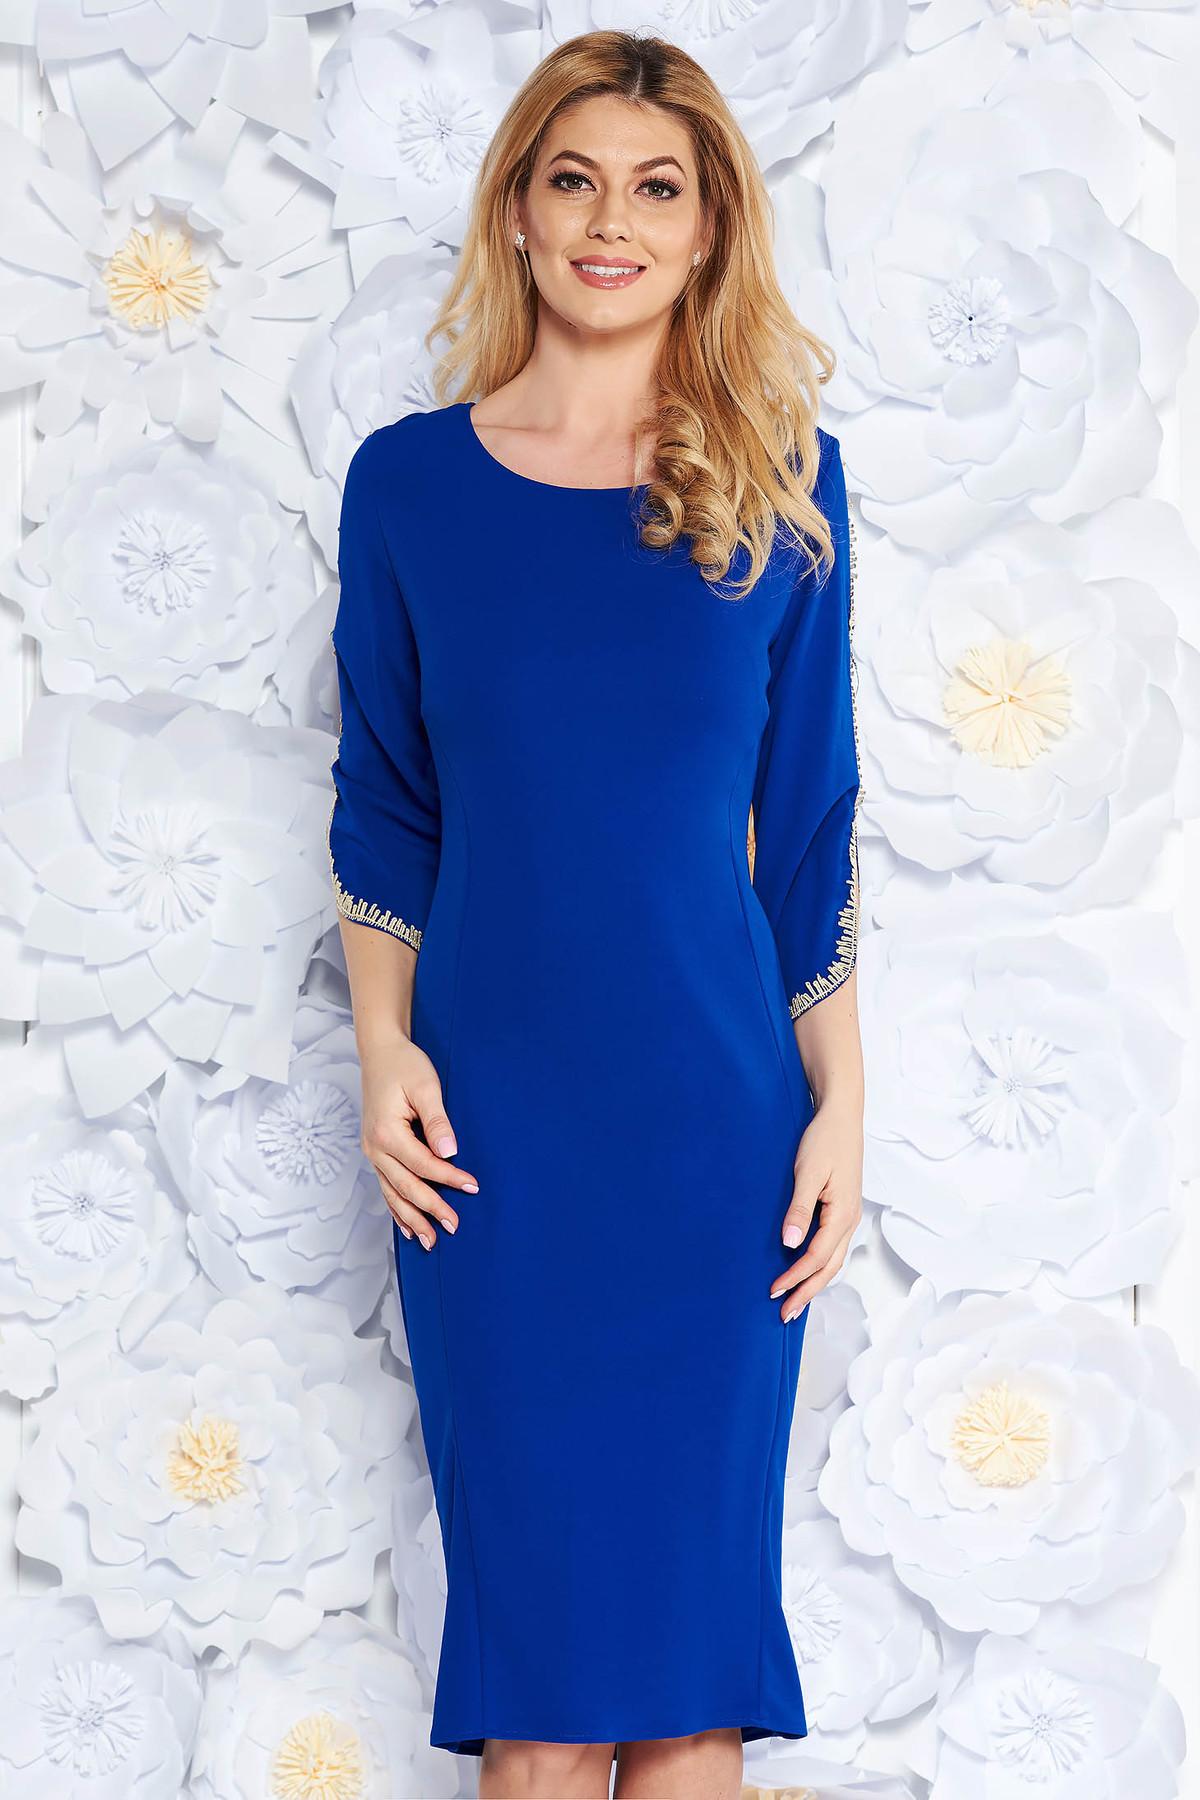 Rochie albastra eleganta tip creion din material elastic cu insertii de broderie cu maneci trei-sferturi